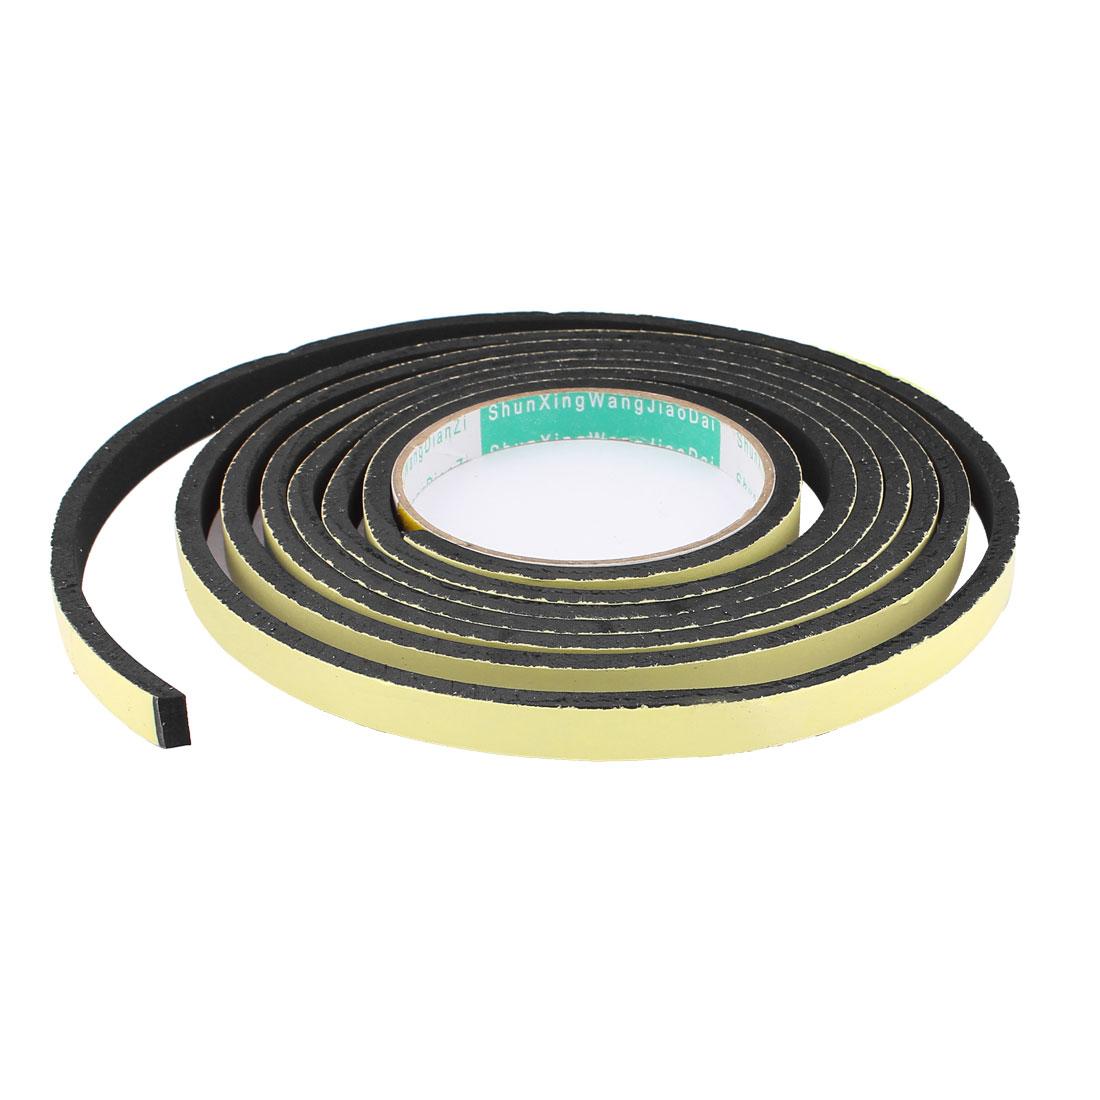 3 Meter 10mm x 5mm Single Side Adhesive Foam Sealing Tape for Door Window